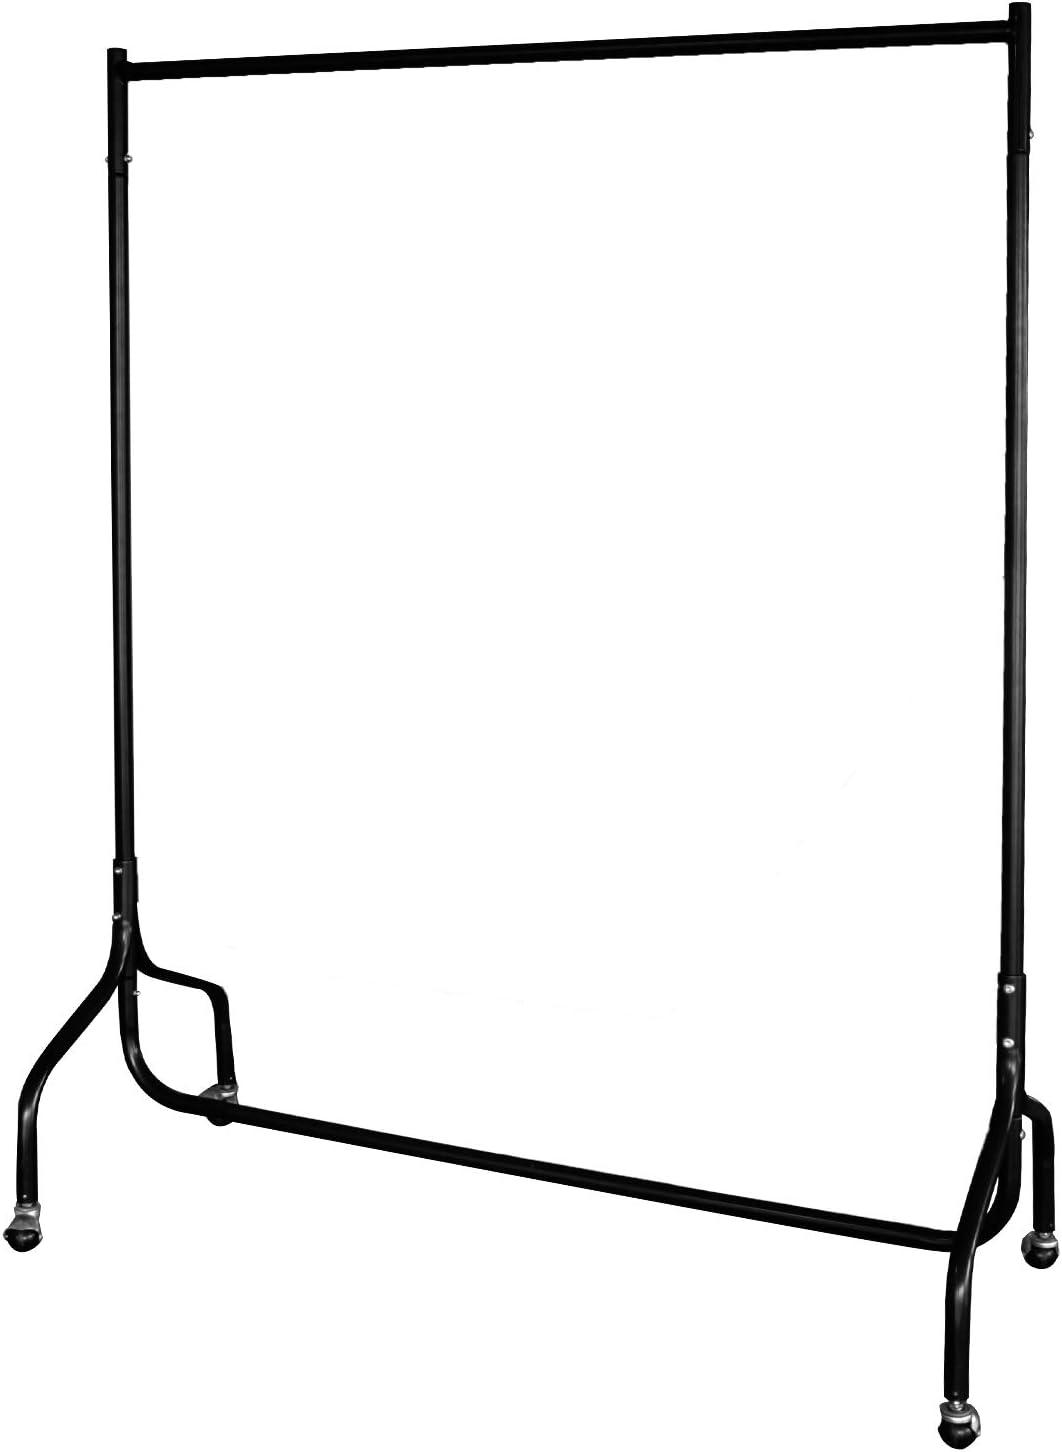 EZVOV Heavy Duty Clothes Rail Garment Rack 4 ft Long x 5 ft High, Black